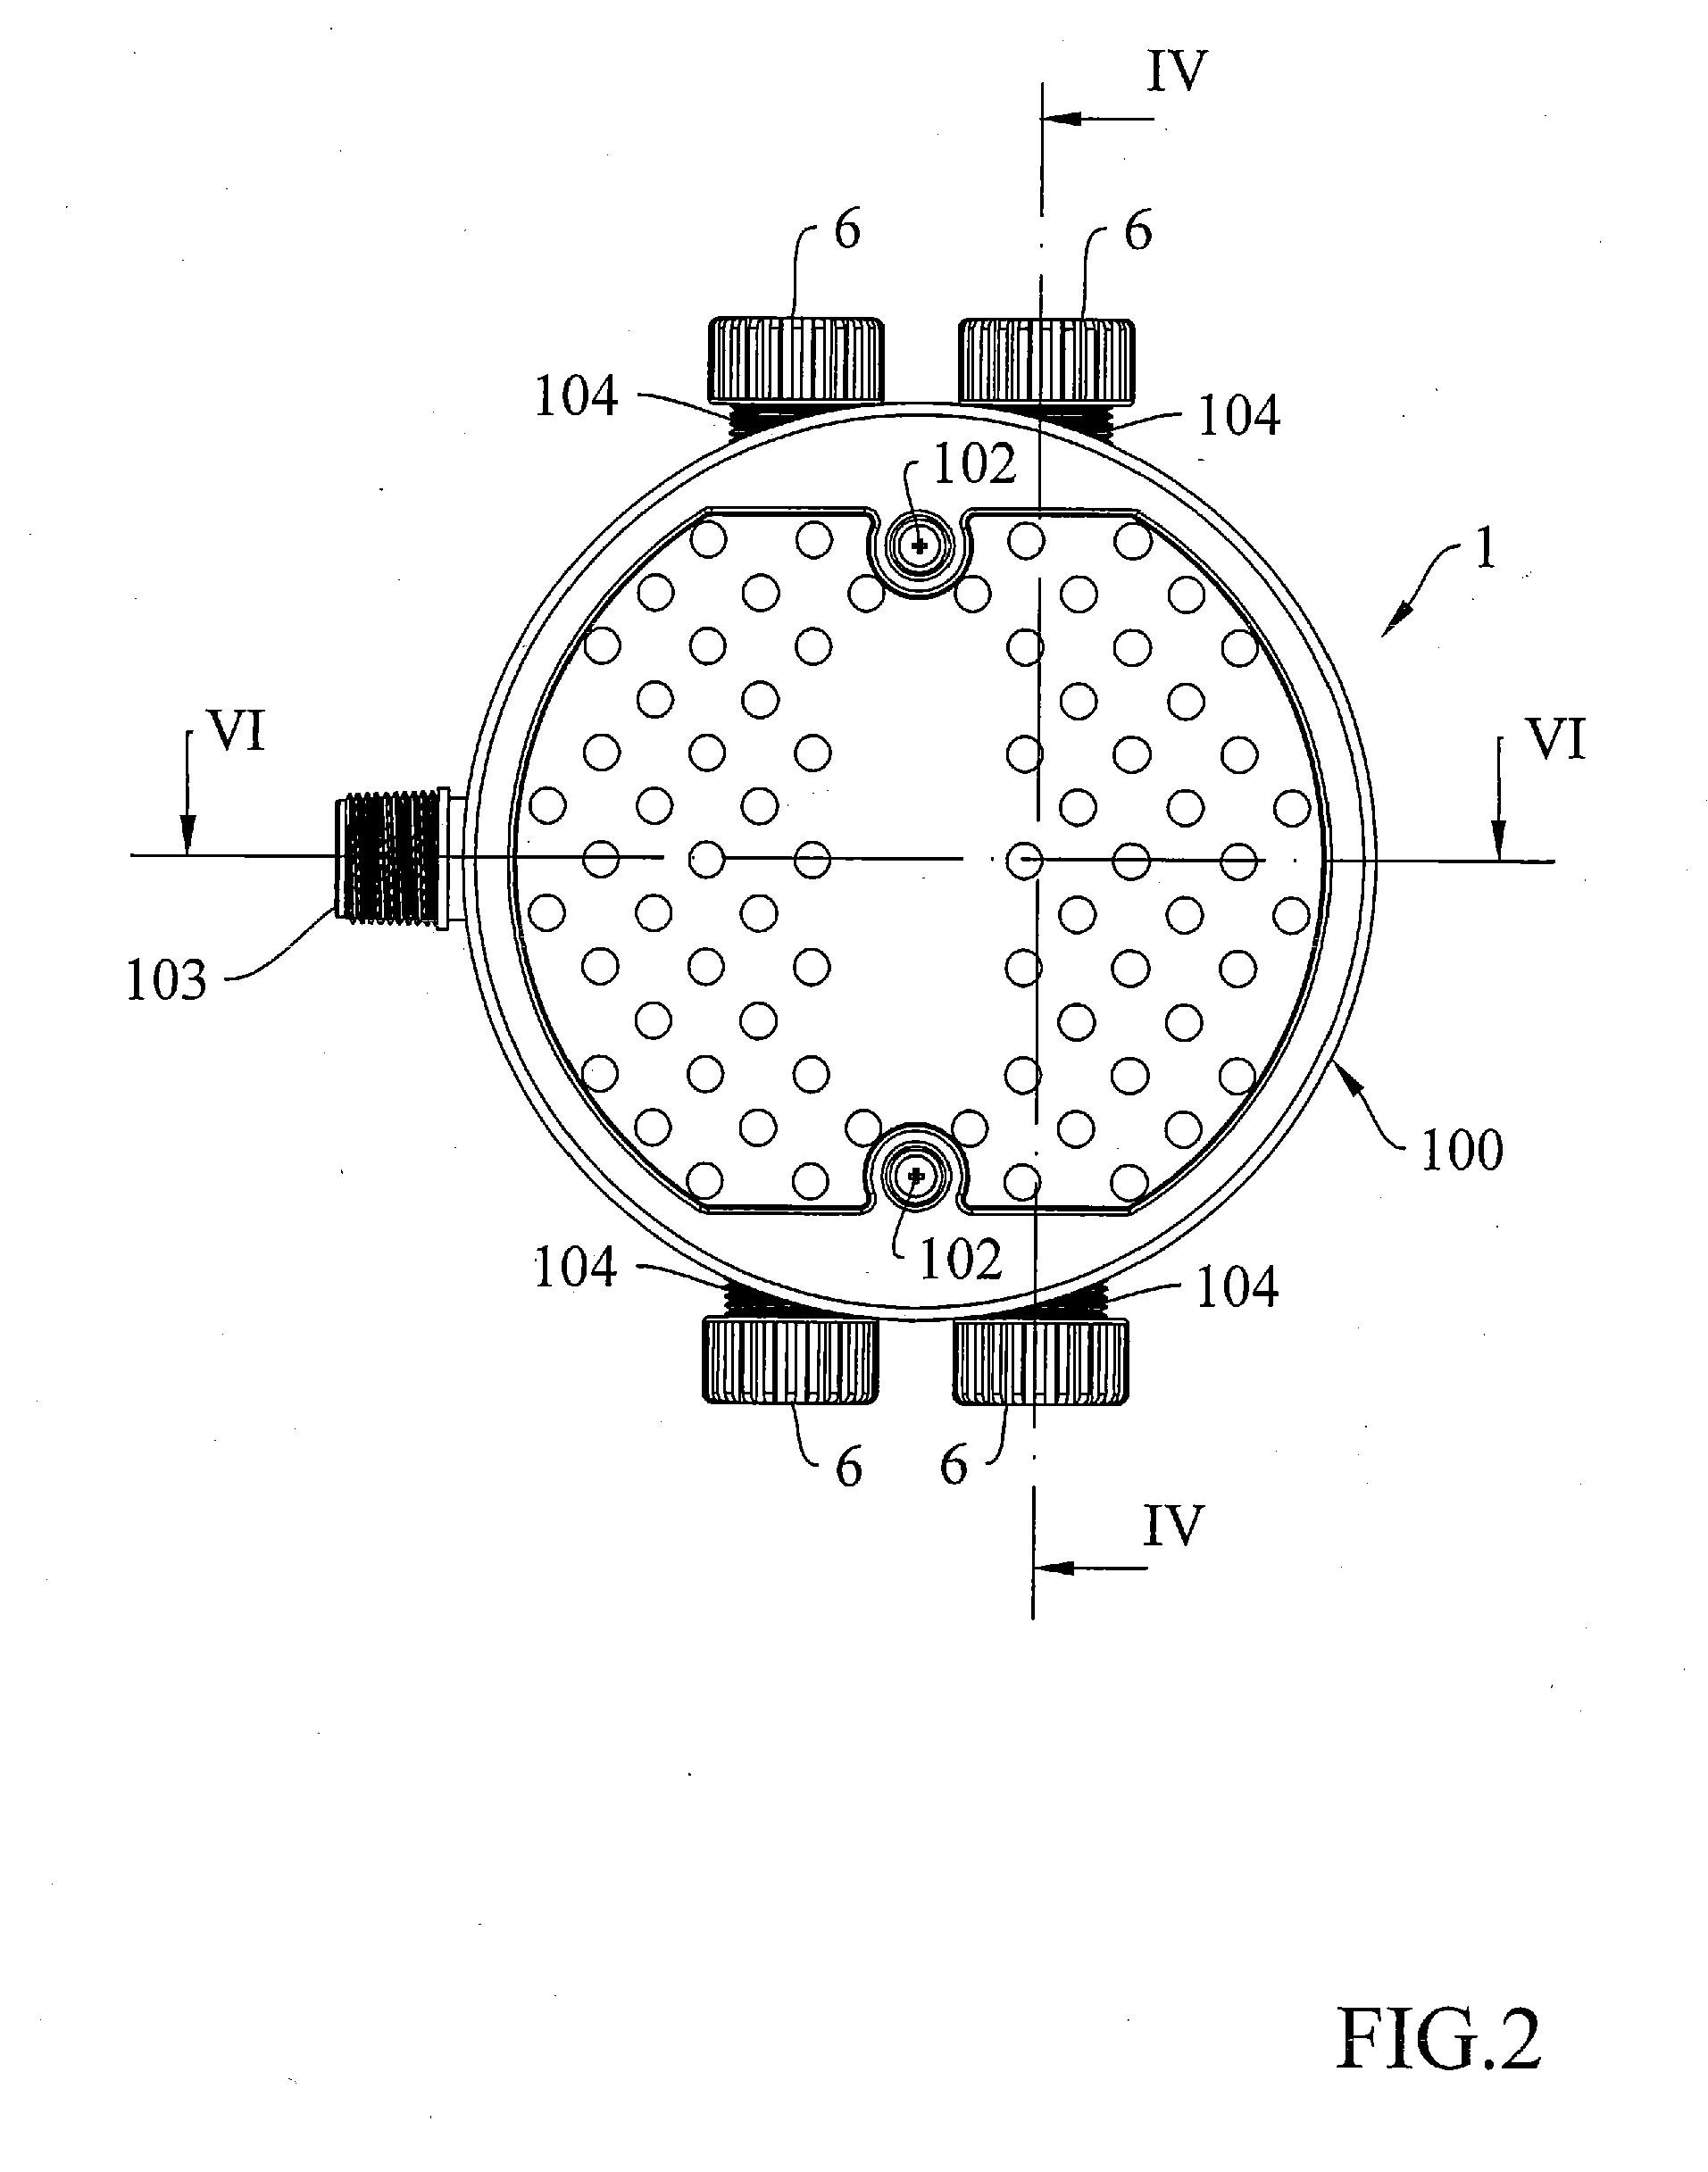 hight resolution of wiring diagram for sprinkler system